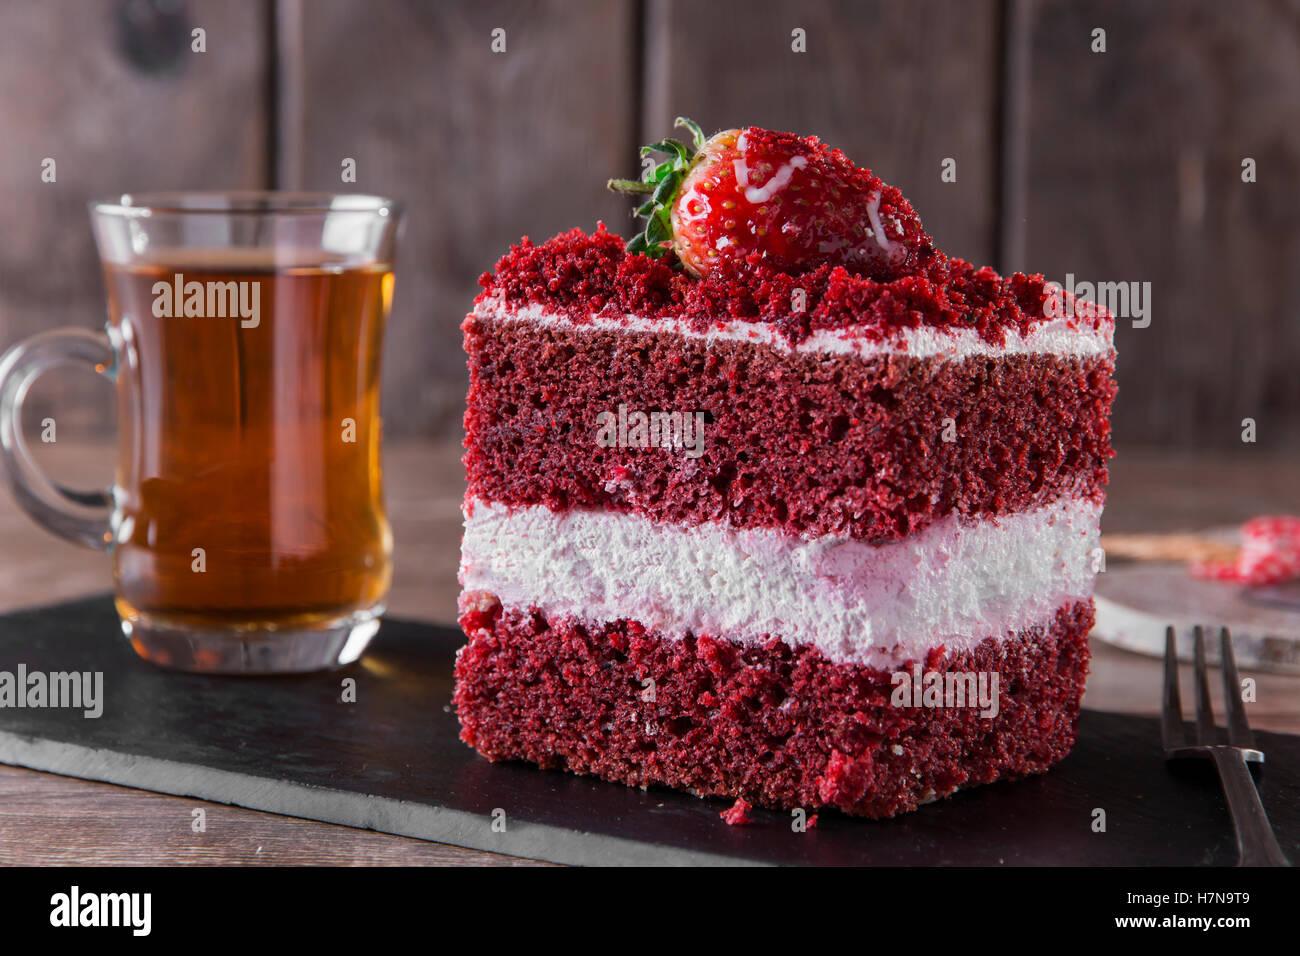 Roter Samtkuchen Stockfotos Roter Samtkuchen Bilder Alamy